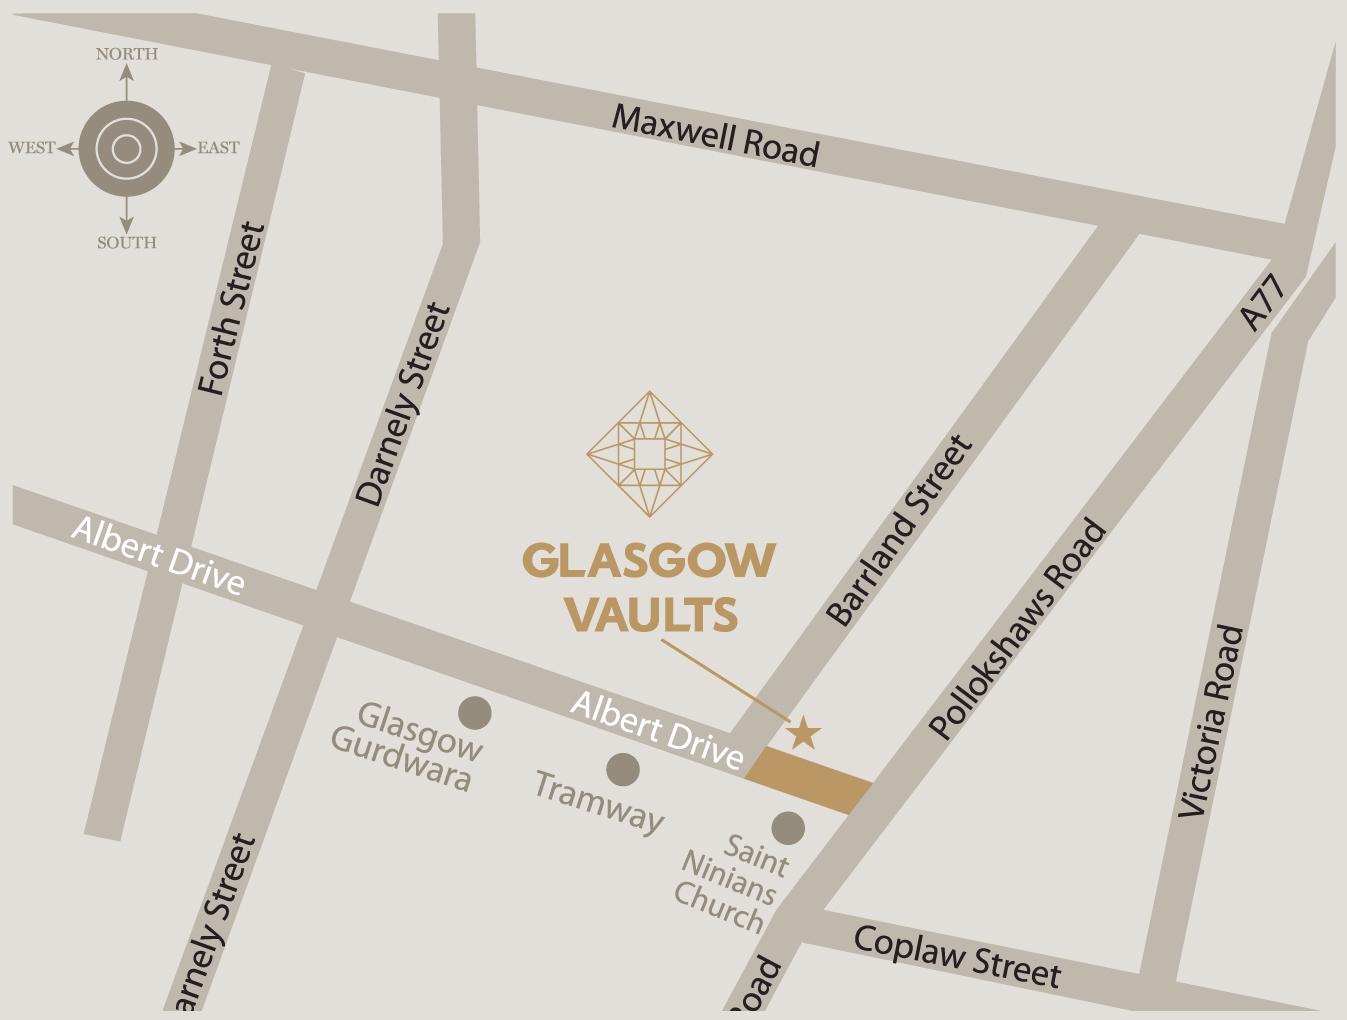 Safety Deposit Box Facility in Glasgow